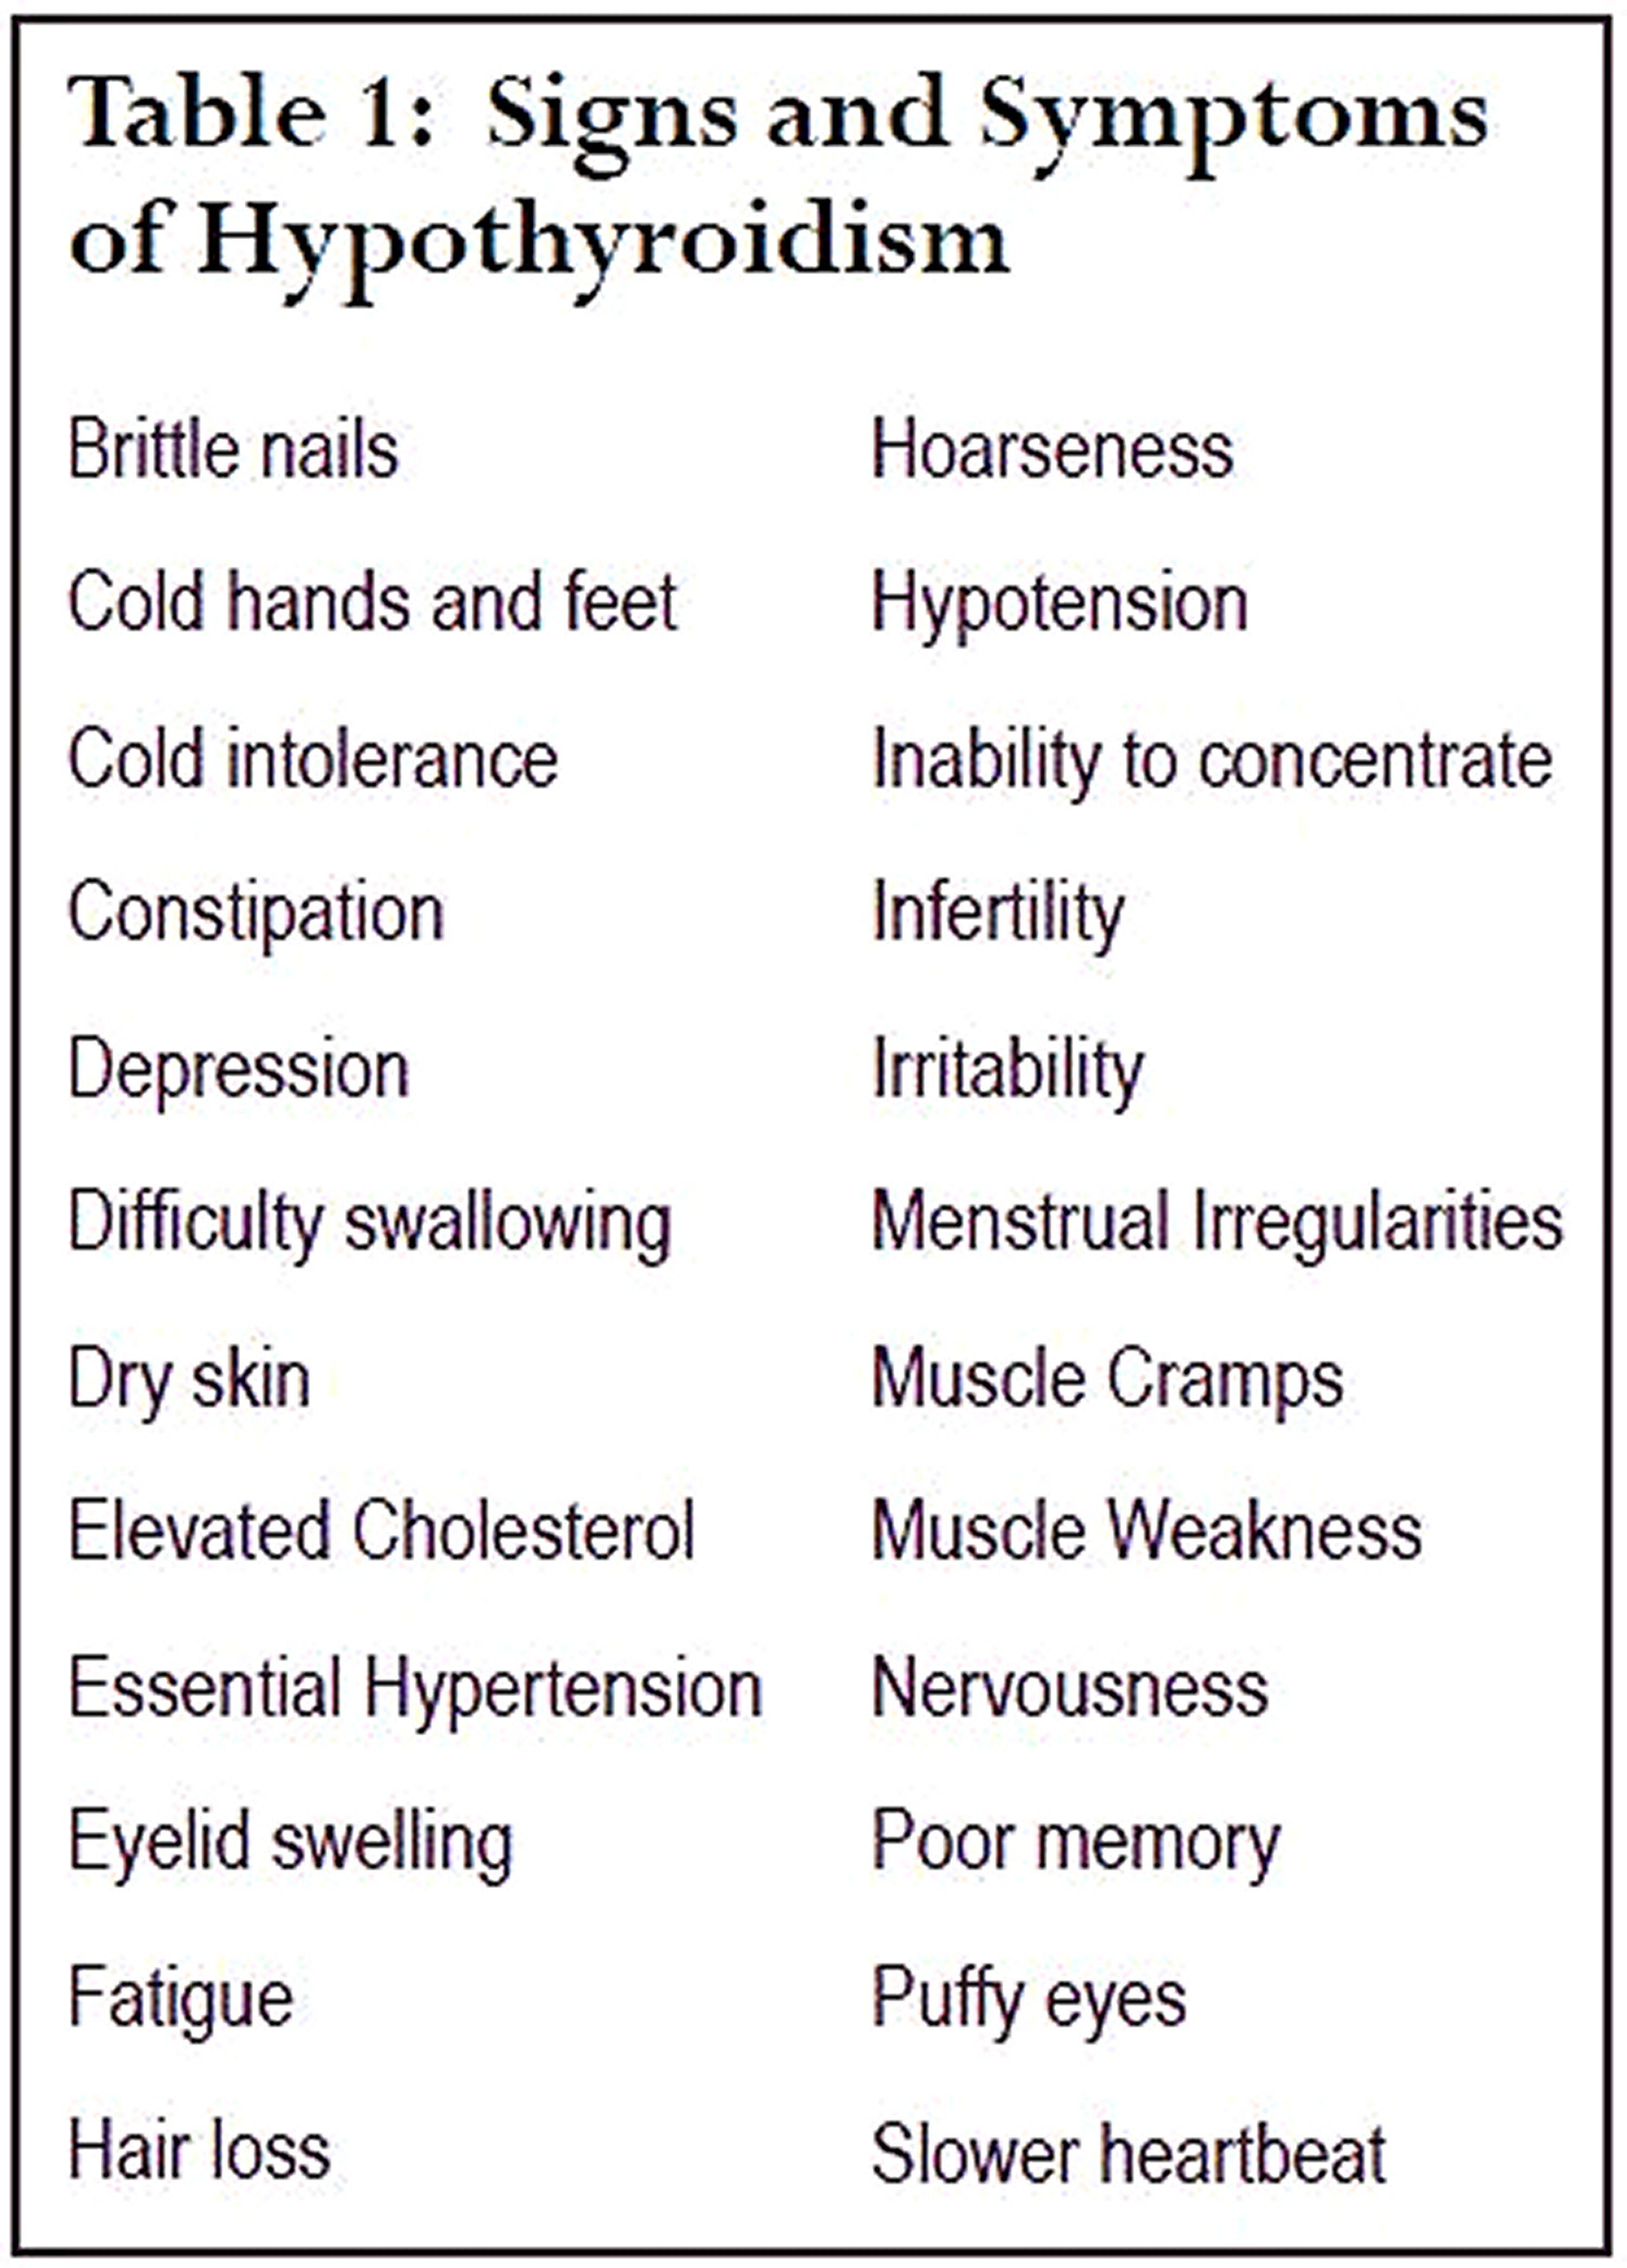 Adrenal Fatigue Symptoms And Signs Hypothyroidism Symptoms Thyroid Symptoms Thyroid Problems